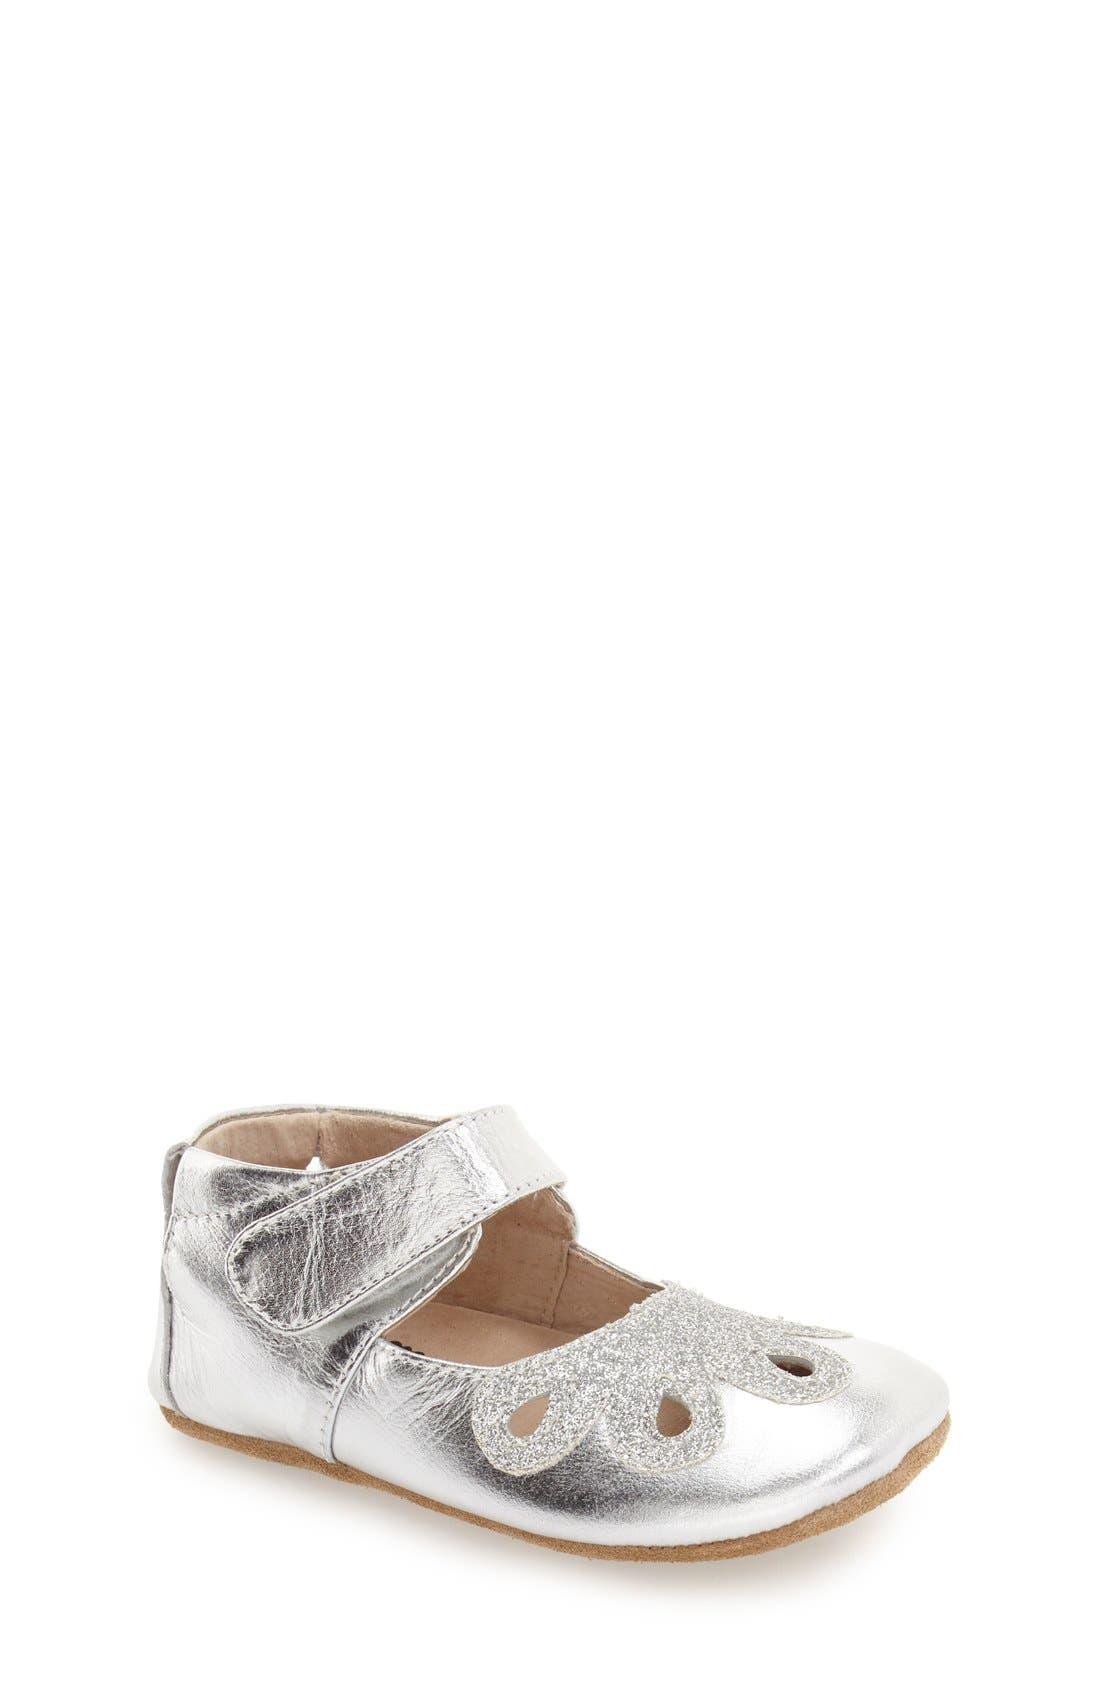 'Petal' Mary Jane Crib Shoe,                             Main thumbnail 1, color,                             Platinum